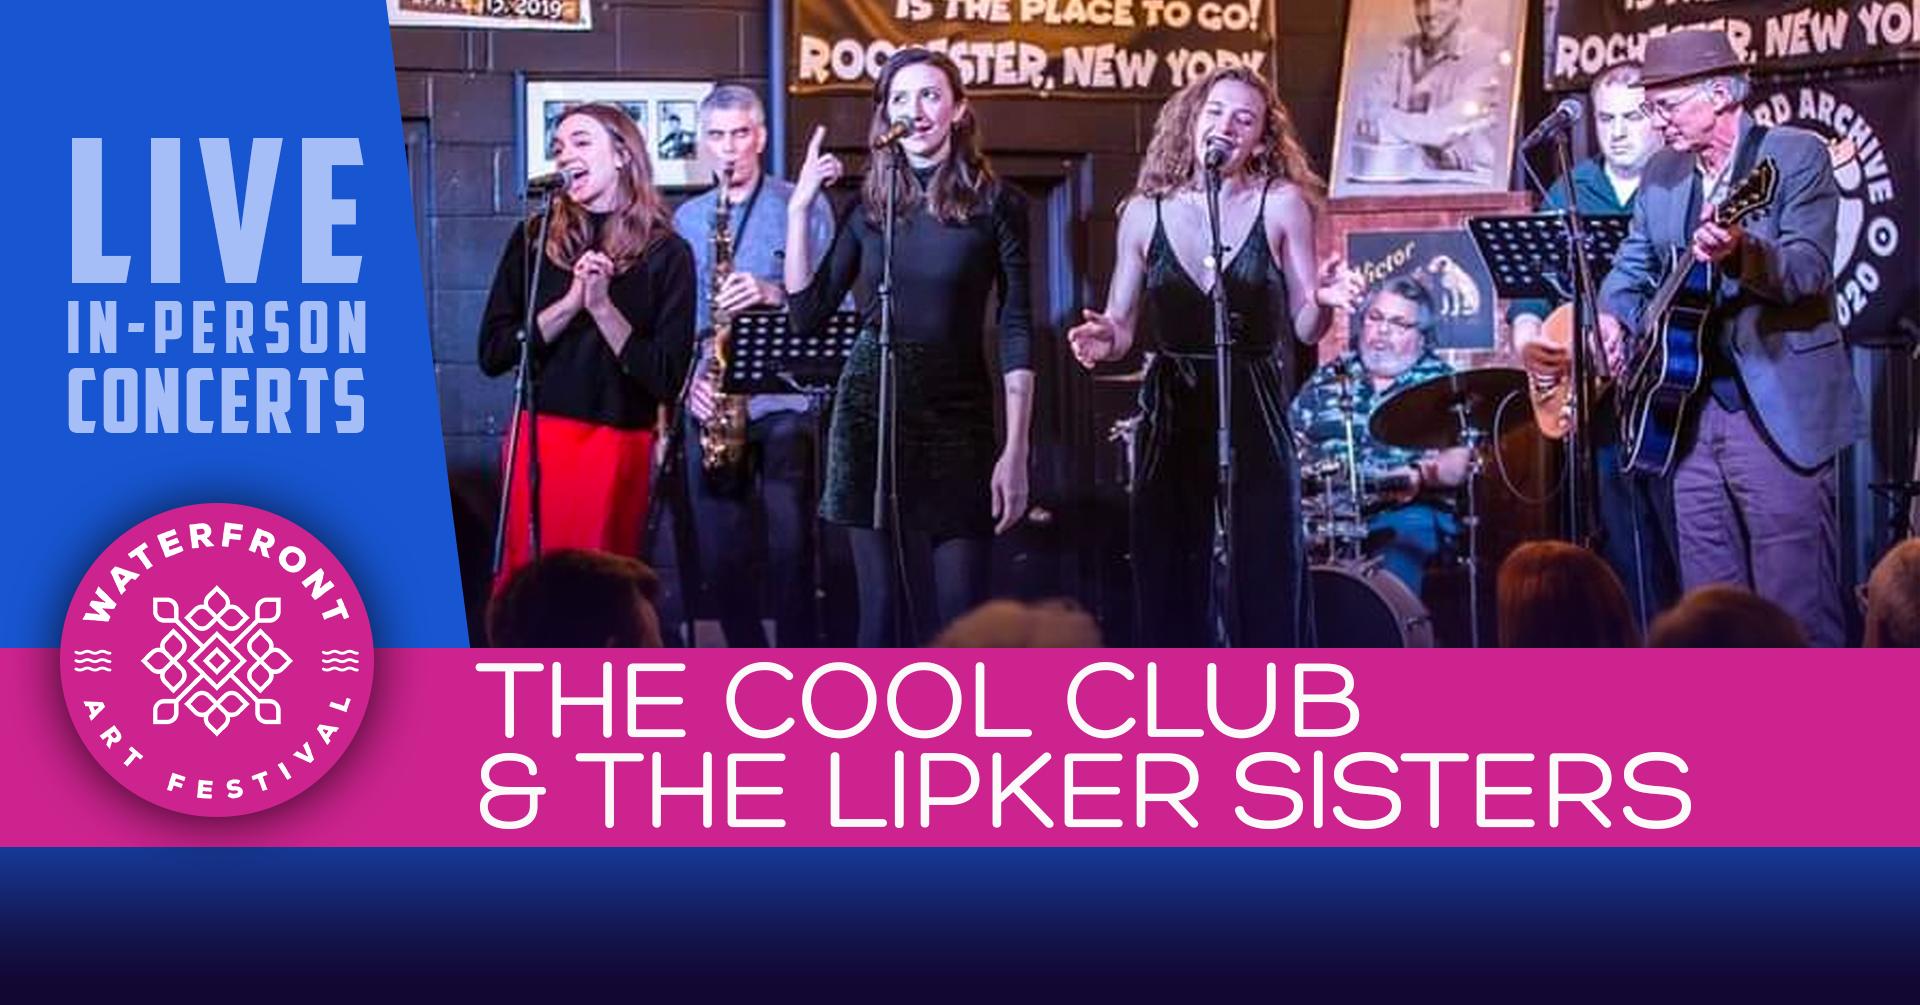 Cool Club & The Lipker Sisters